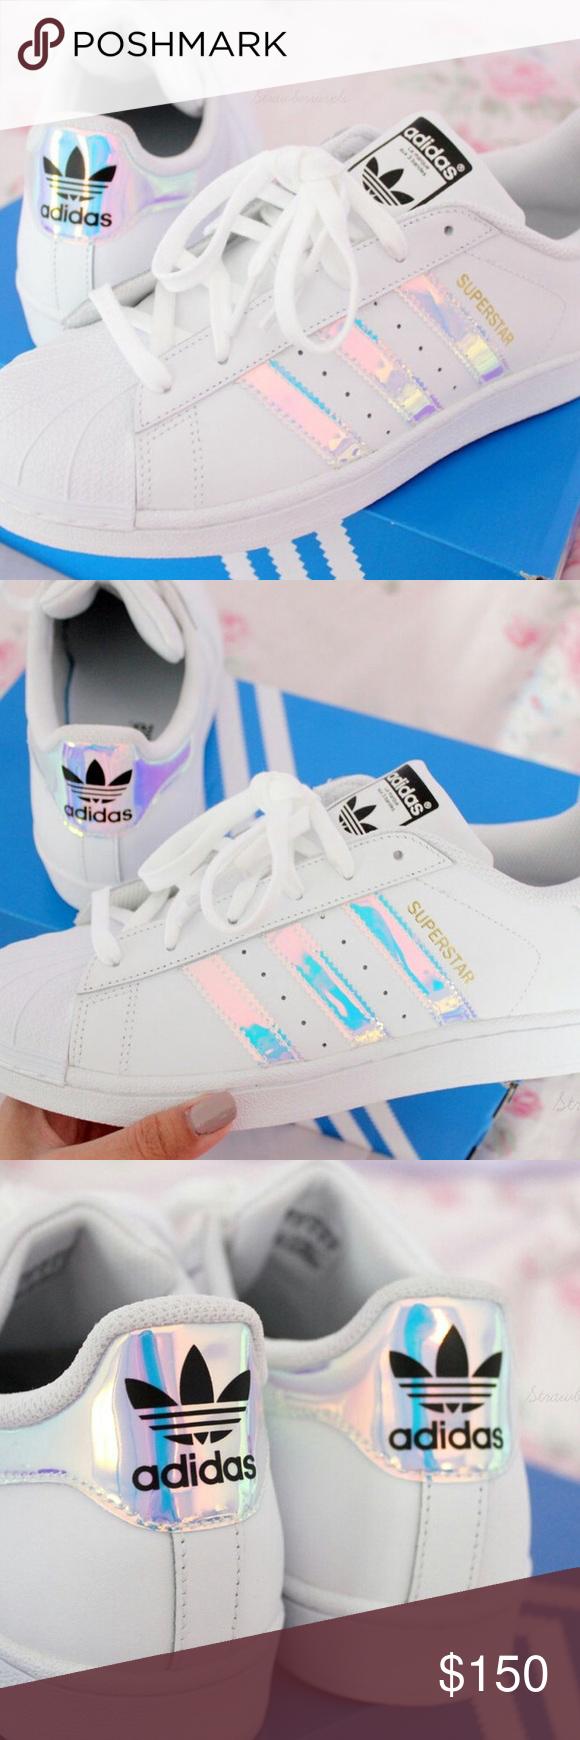 Fashion Shoes Adidas on Twitter   Adidas women, Adidas shoes women ...